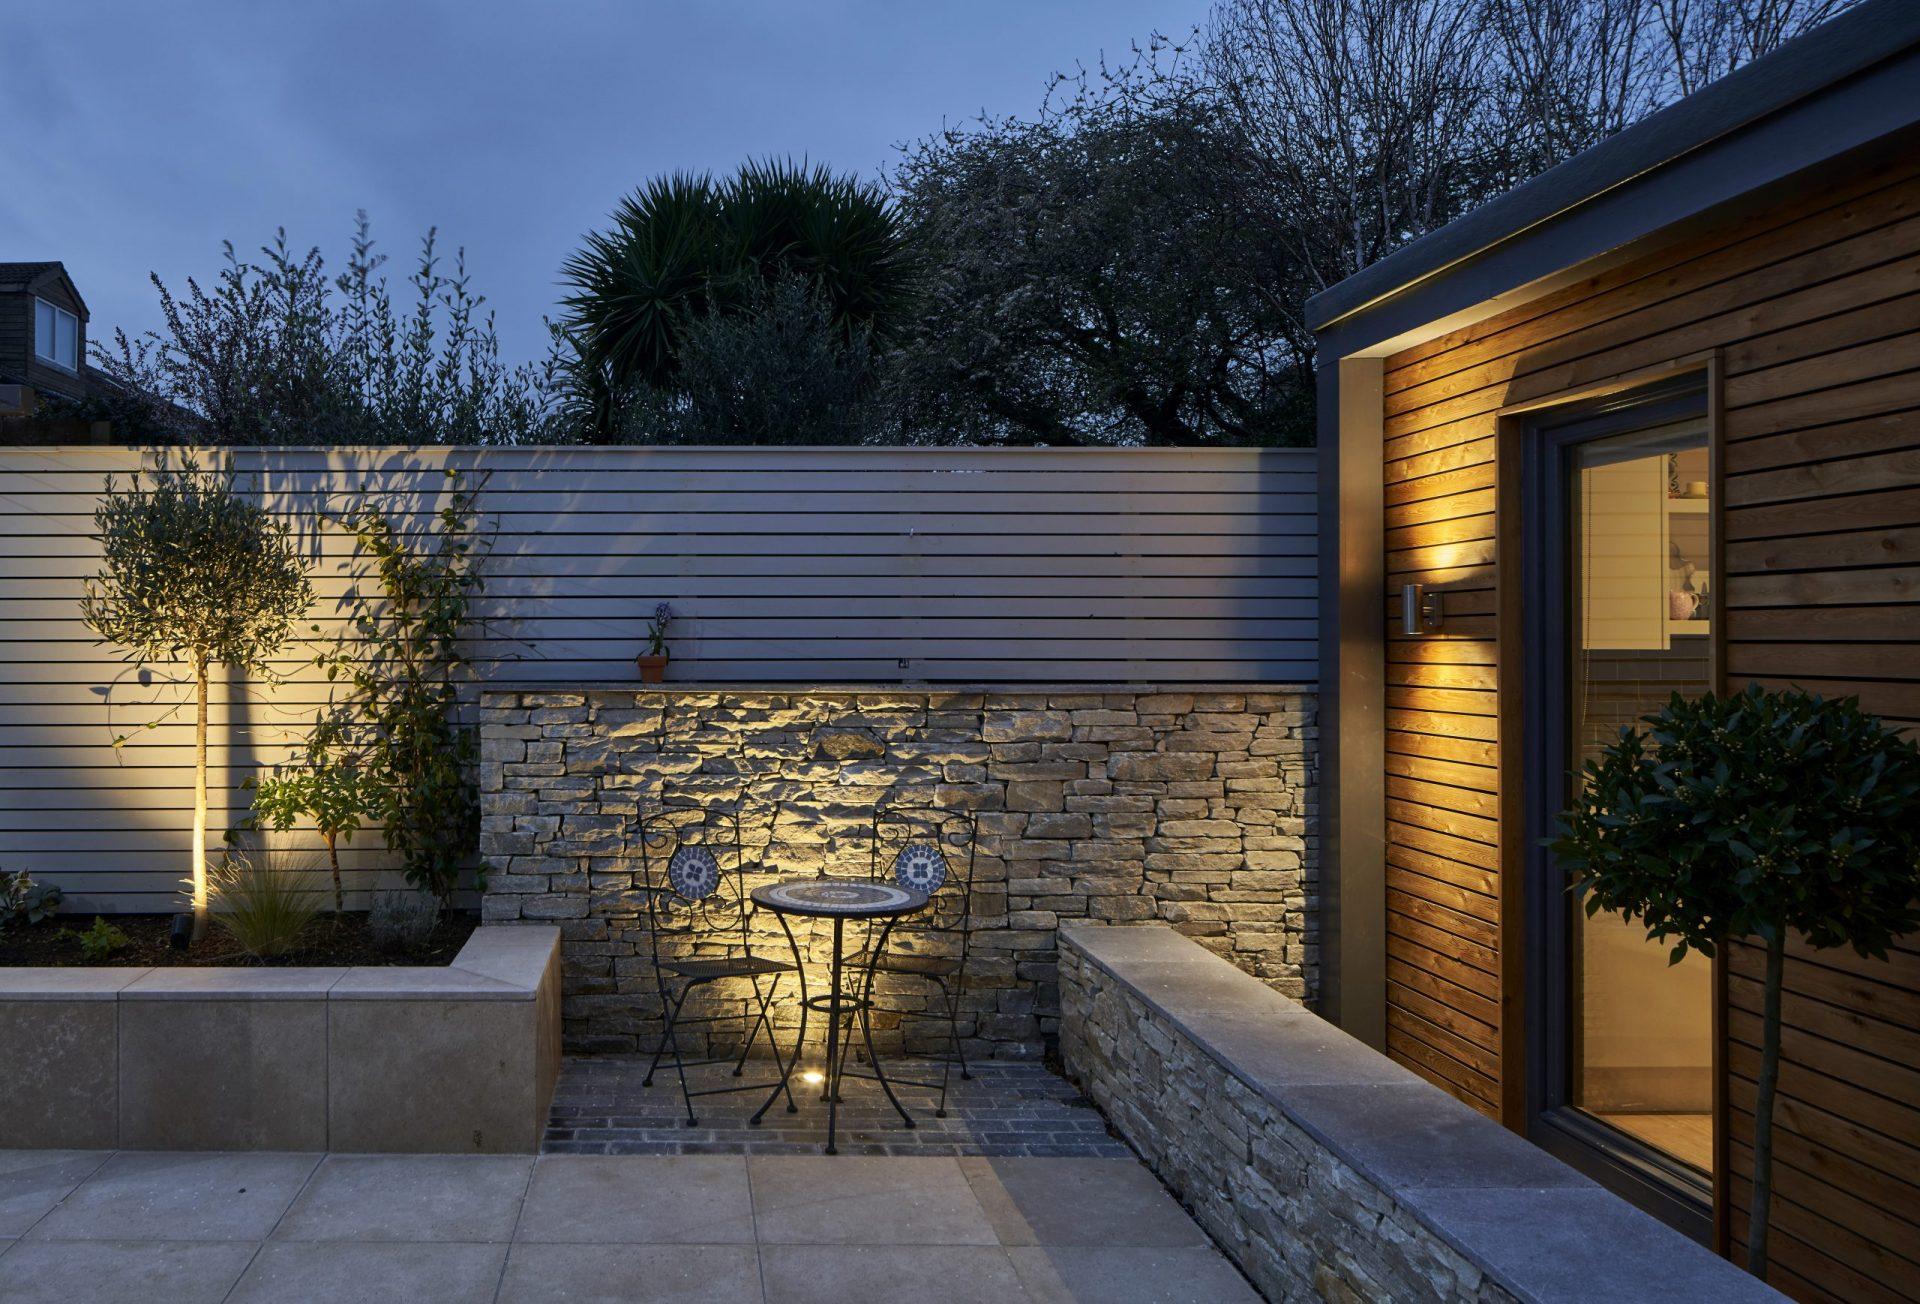 Home Office Courtyard Garden (Glenageary)